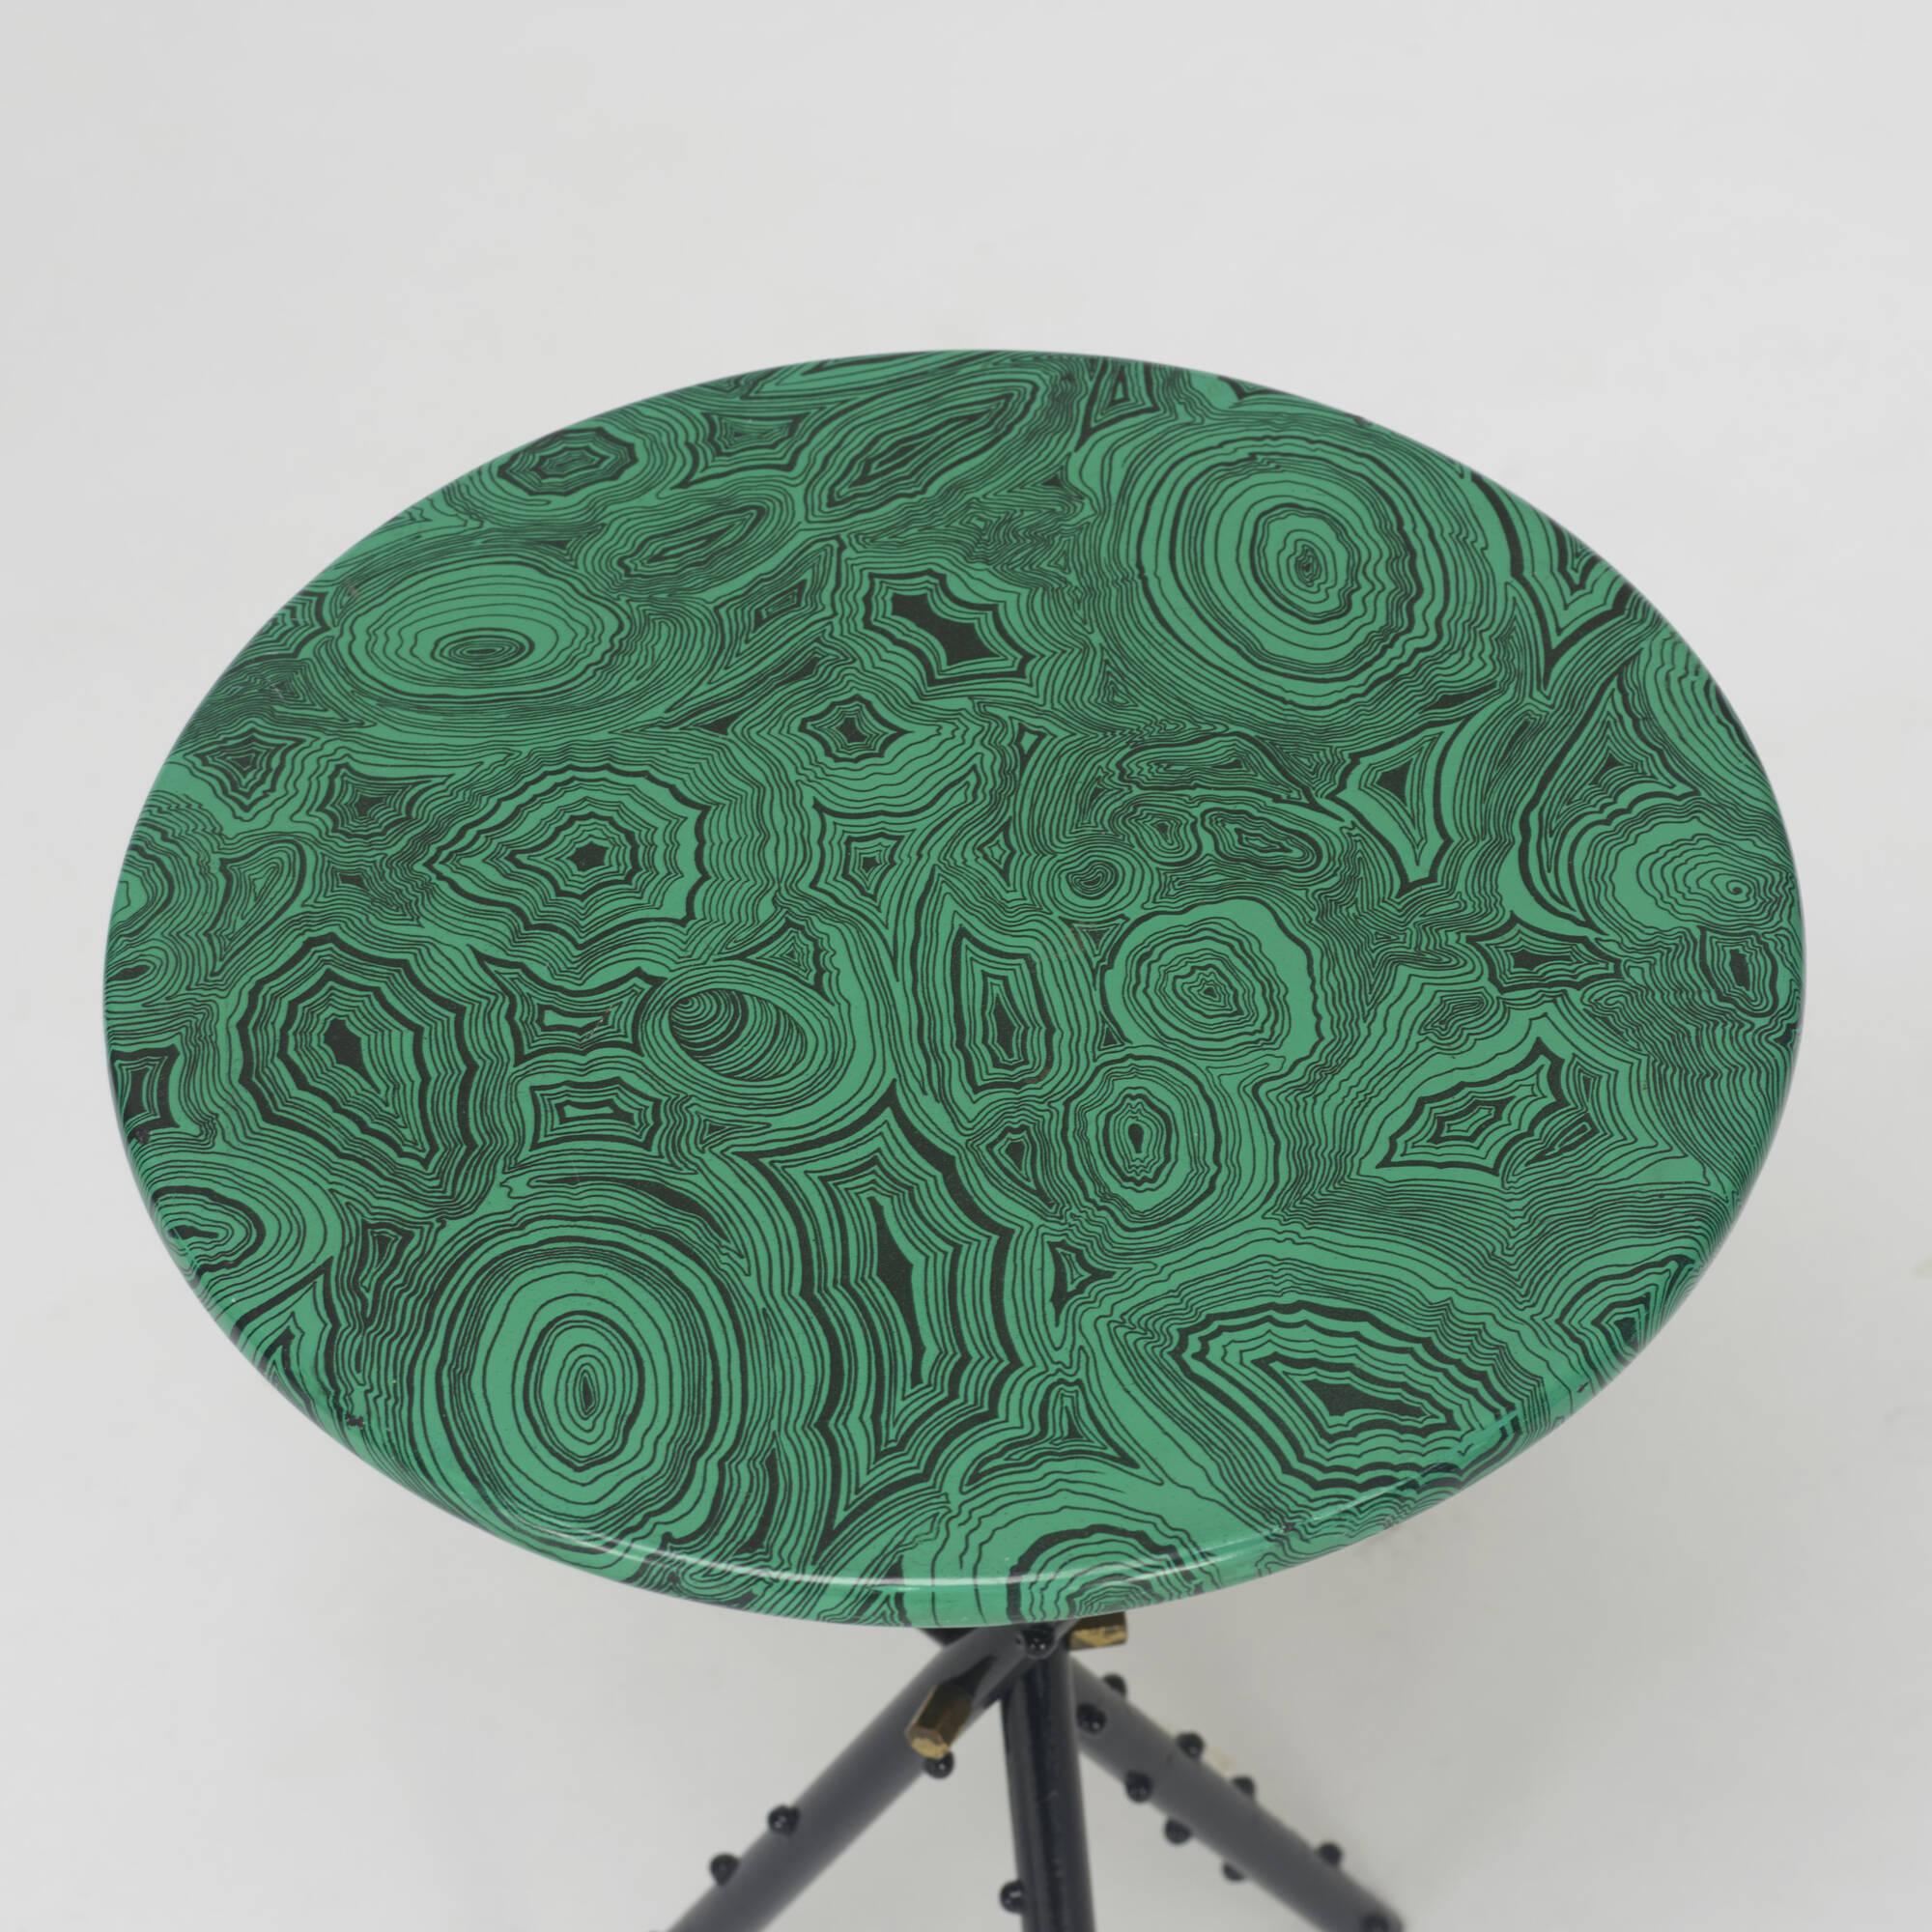 289: Piero Fornasetti / Malachite occasional tables, pair (2 of 3)